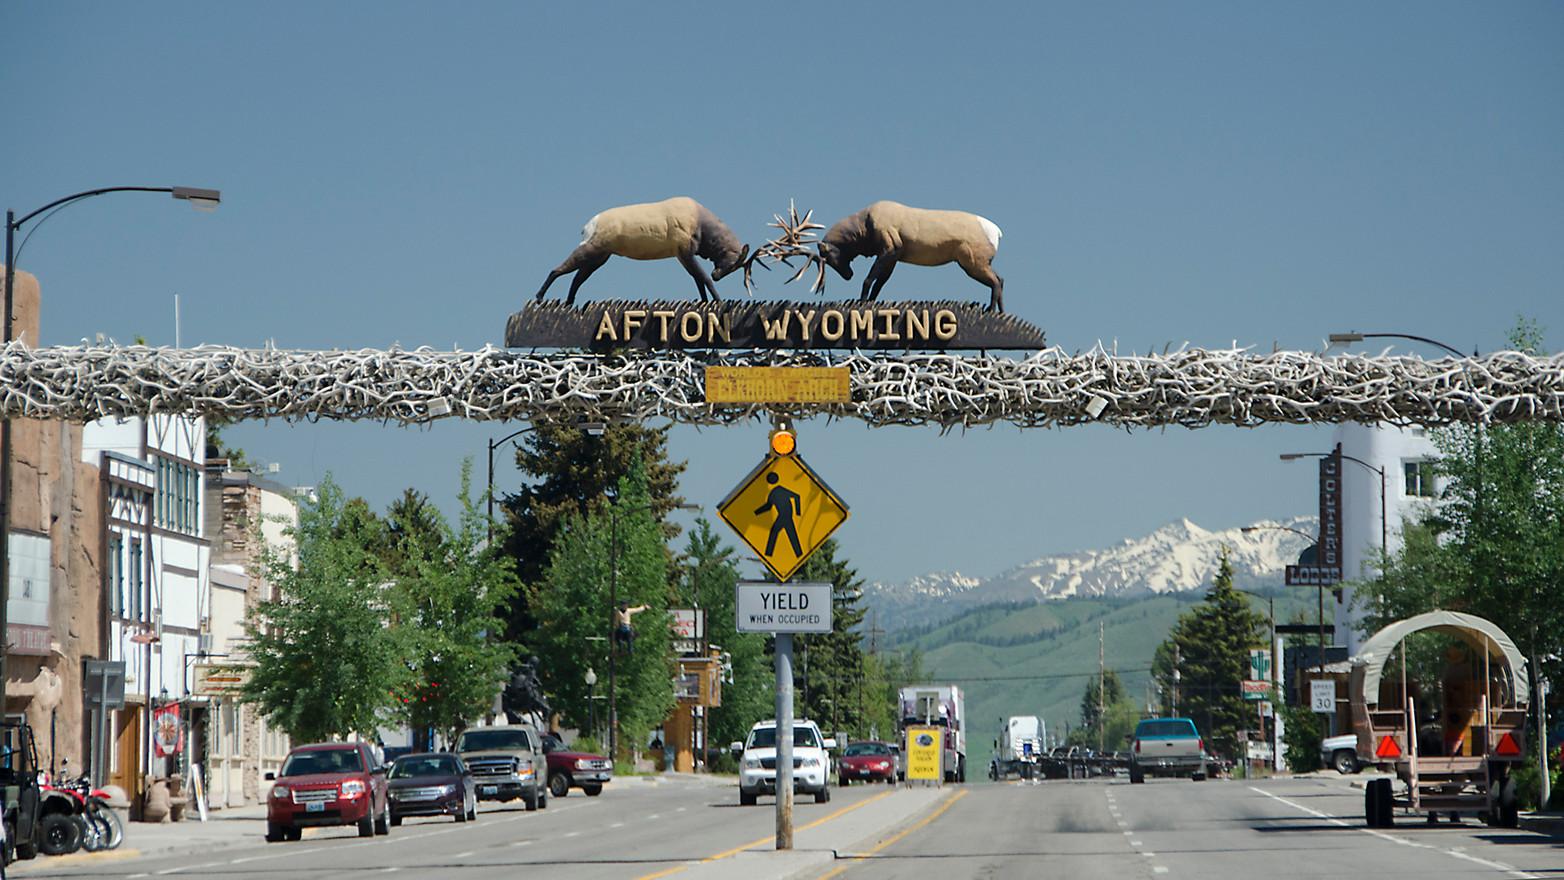 Afton in Wyoming